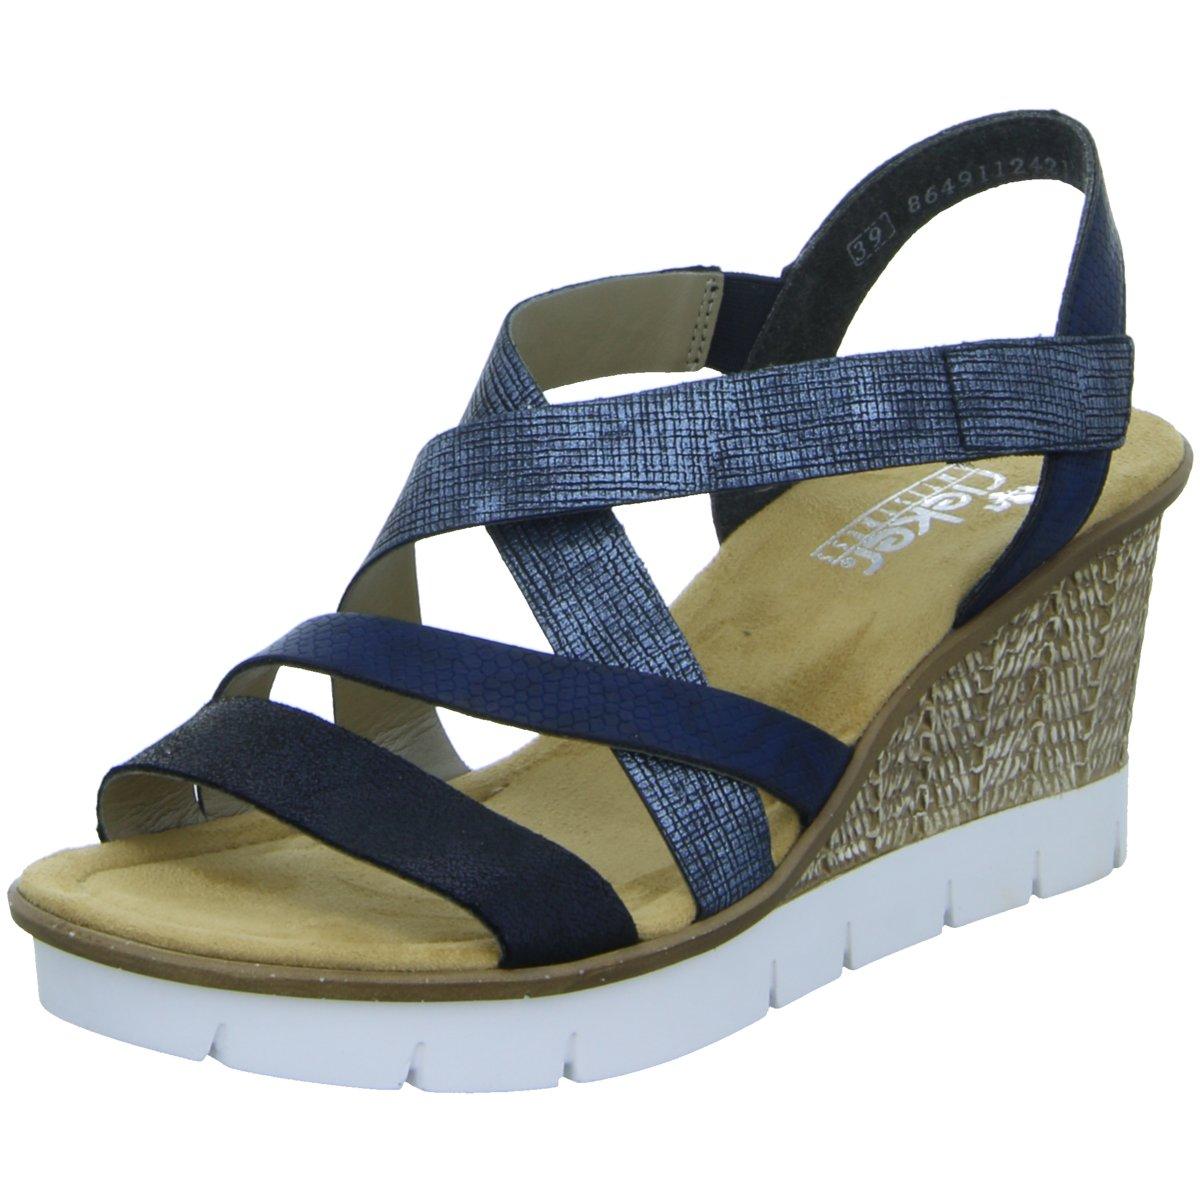 NEU Rieker Damen Sandaletten Sandalette eleganter Boden 65571-14 blau 284552